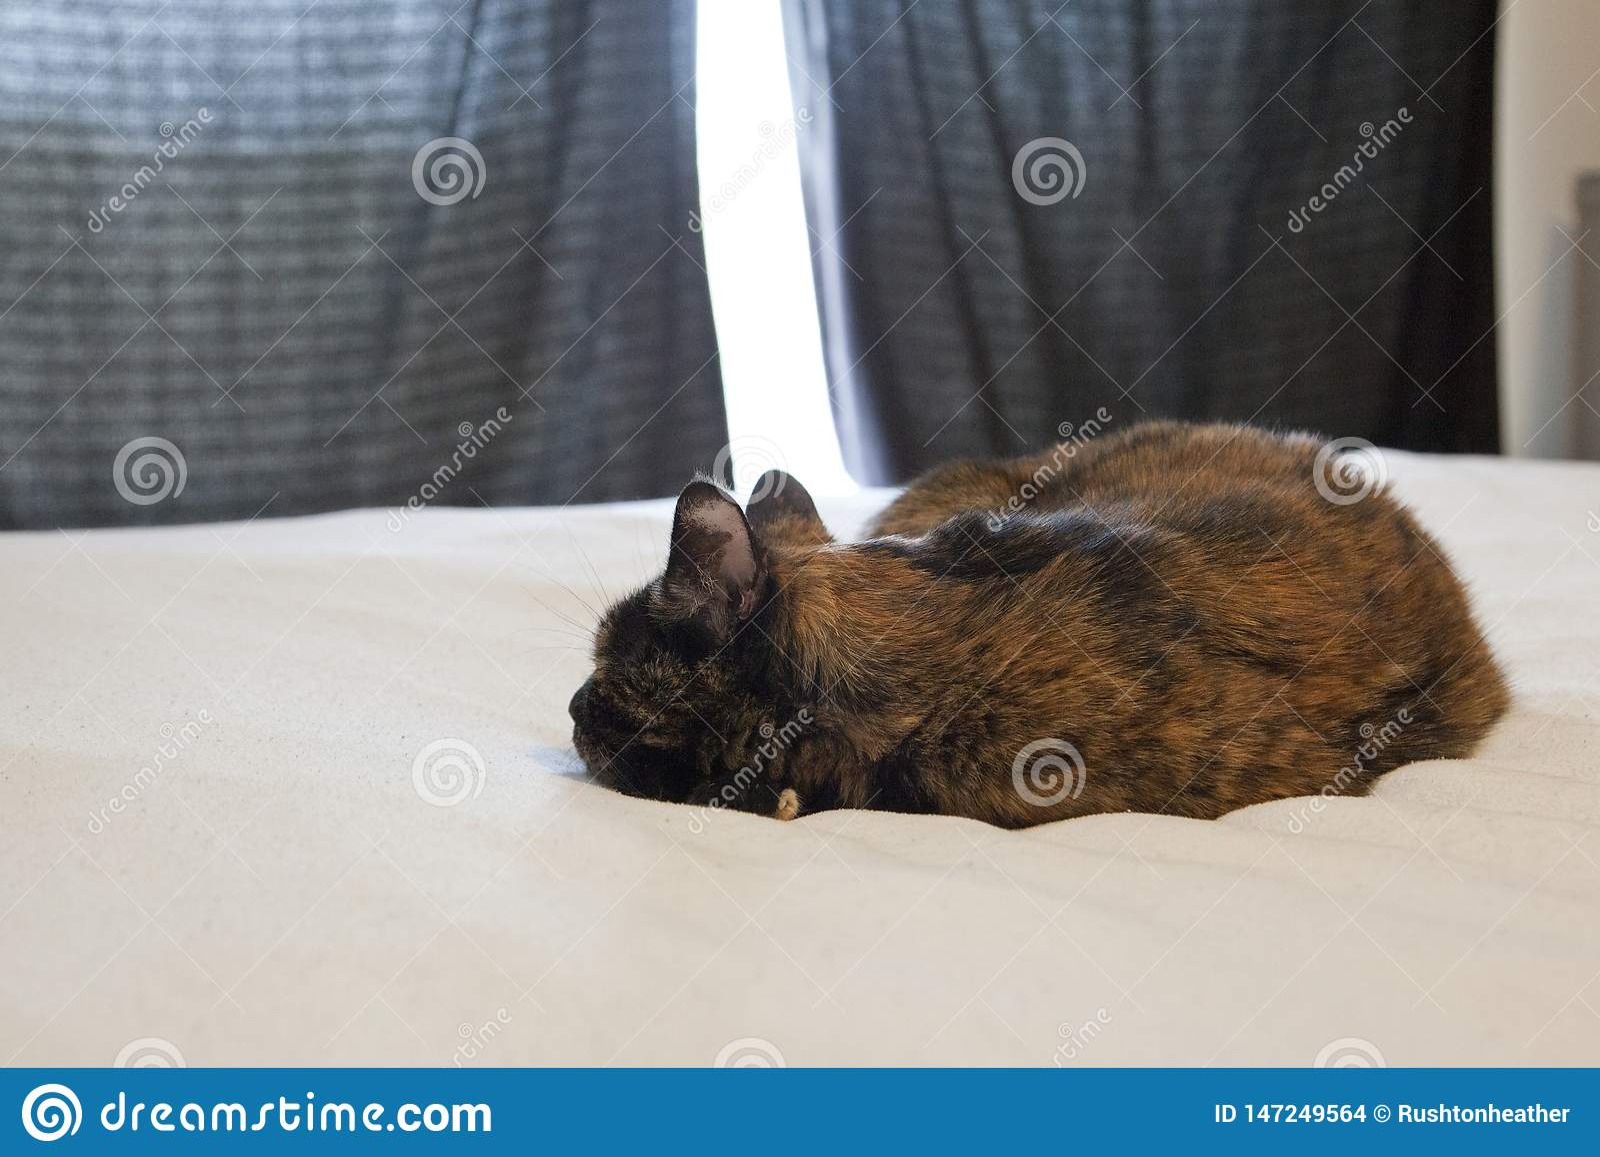 Sendo ignorado pelo gato